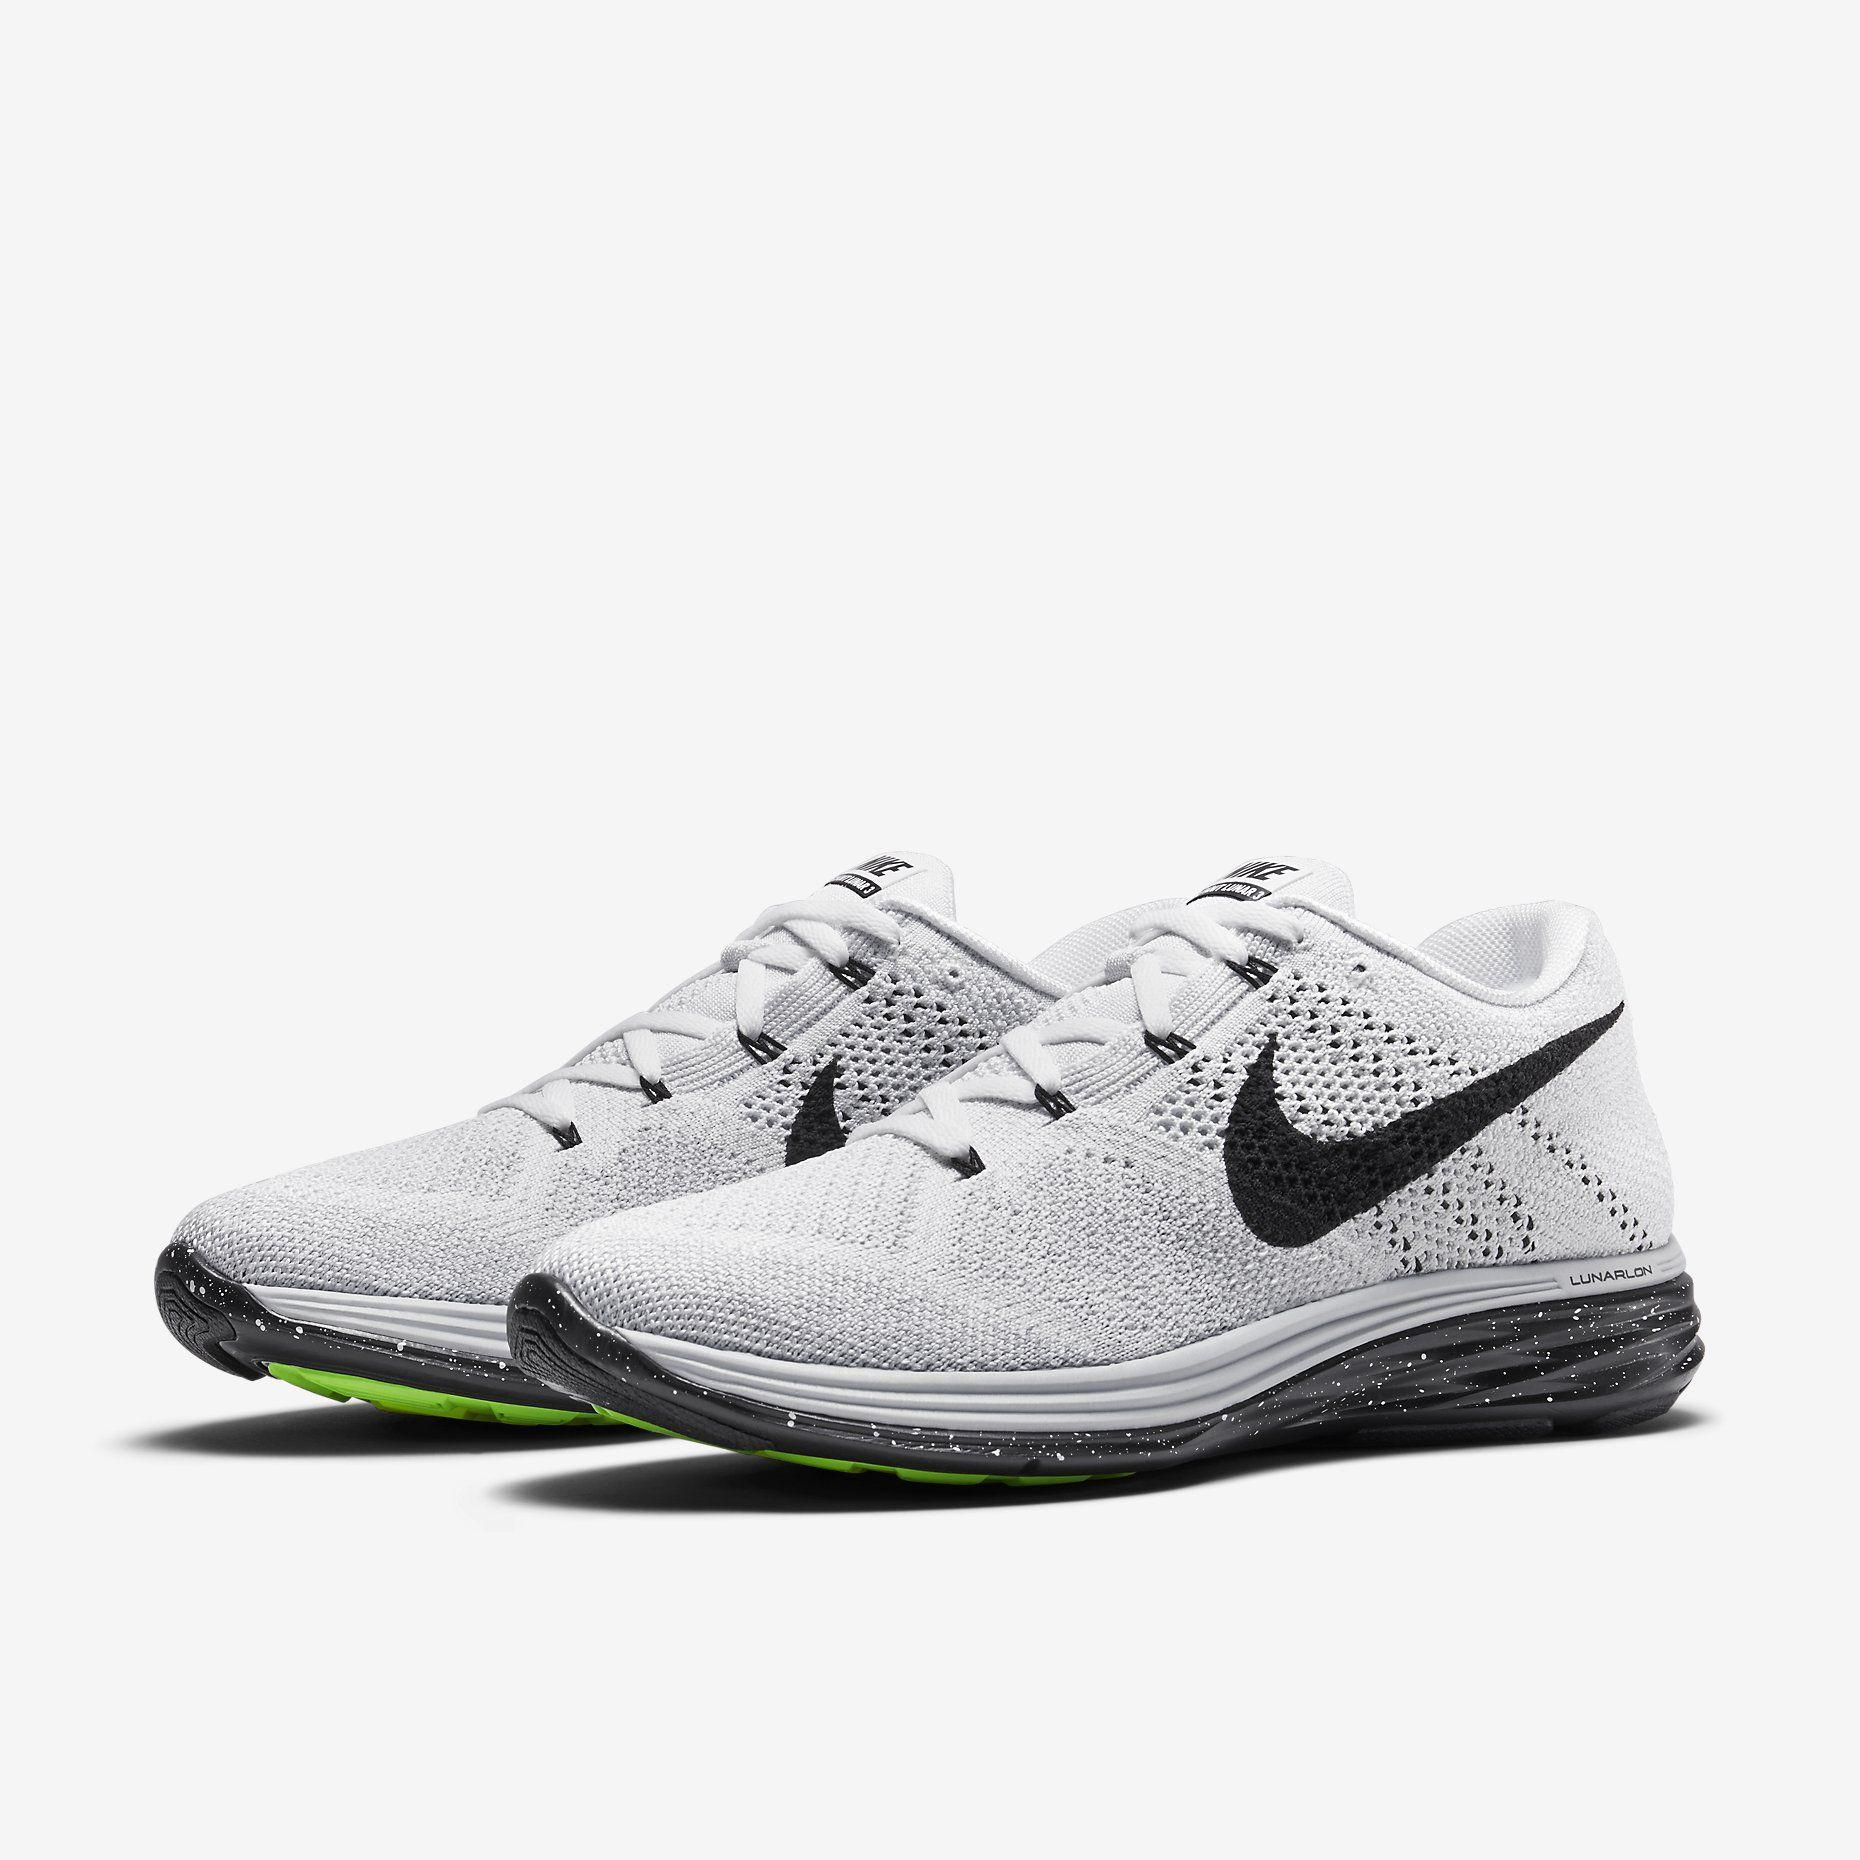 Nike Flyknit Lunar 3 Men S Running Shoe Nike Store Nike Flyknit Lunar 3 Running Shoes For Men Fashion Shoes Sneakers